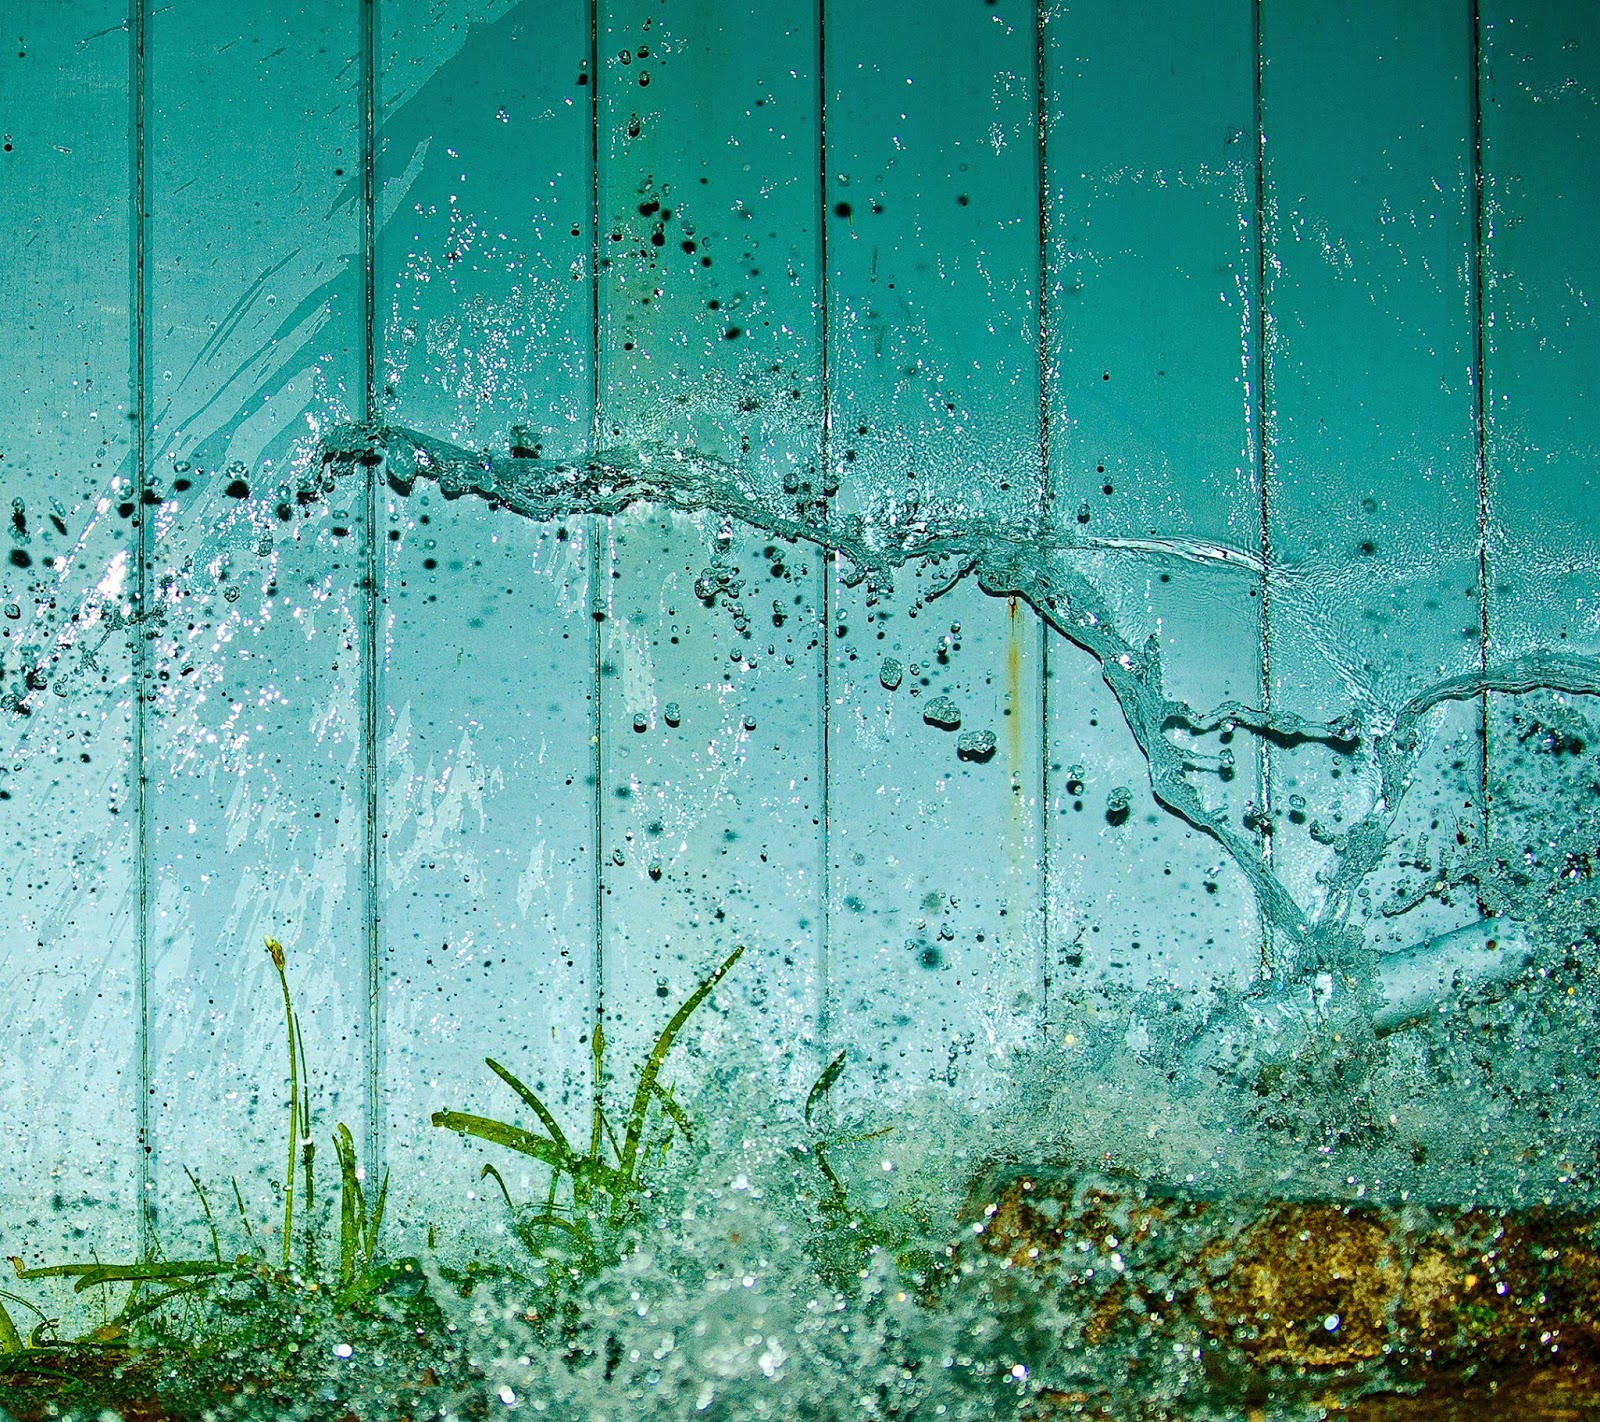 HTC-One-M8-wallpaper